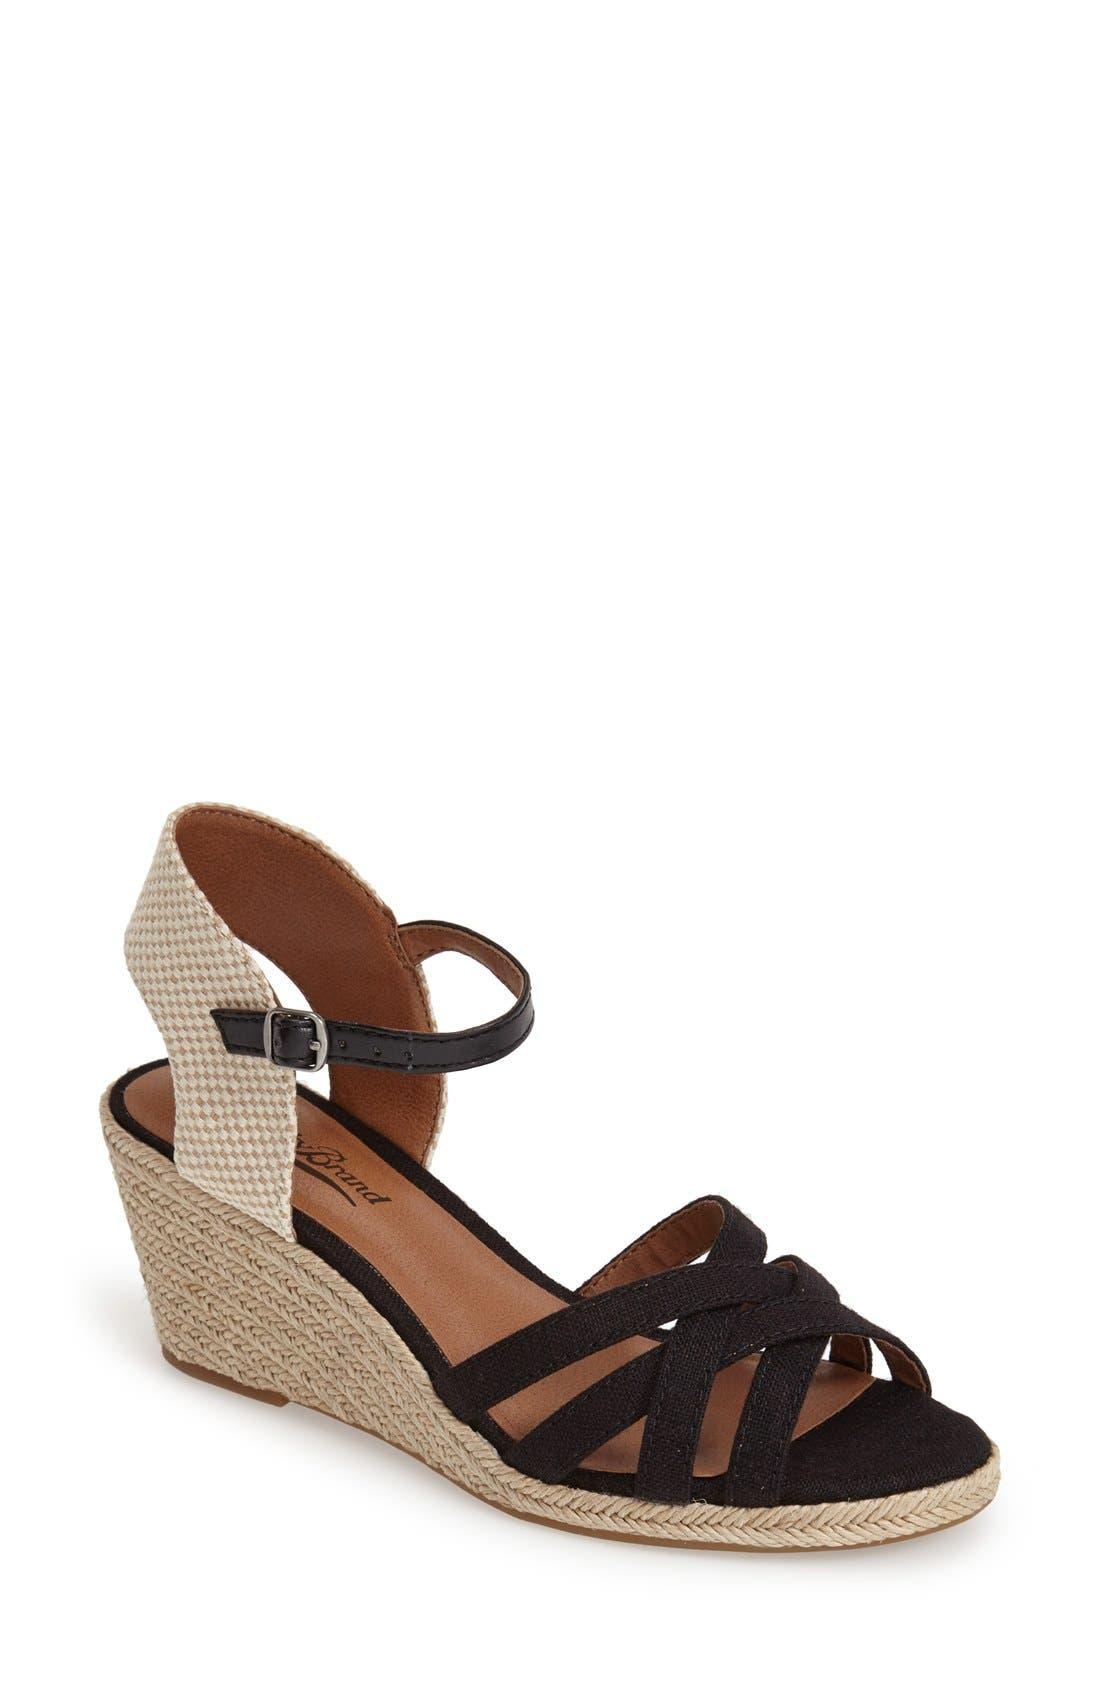 'Kalessie' Espadrille Wedge Sandal, Main, color, 001